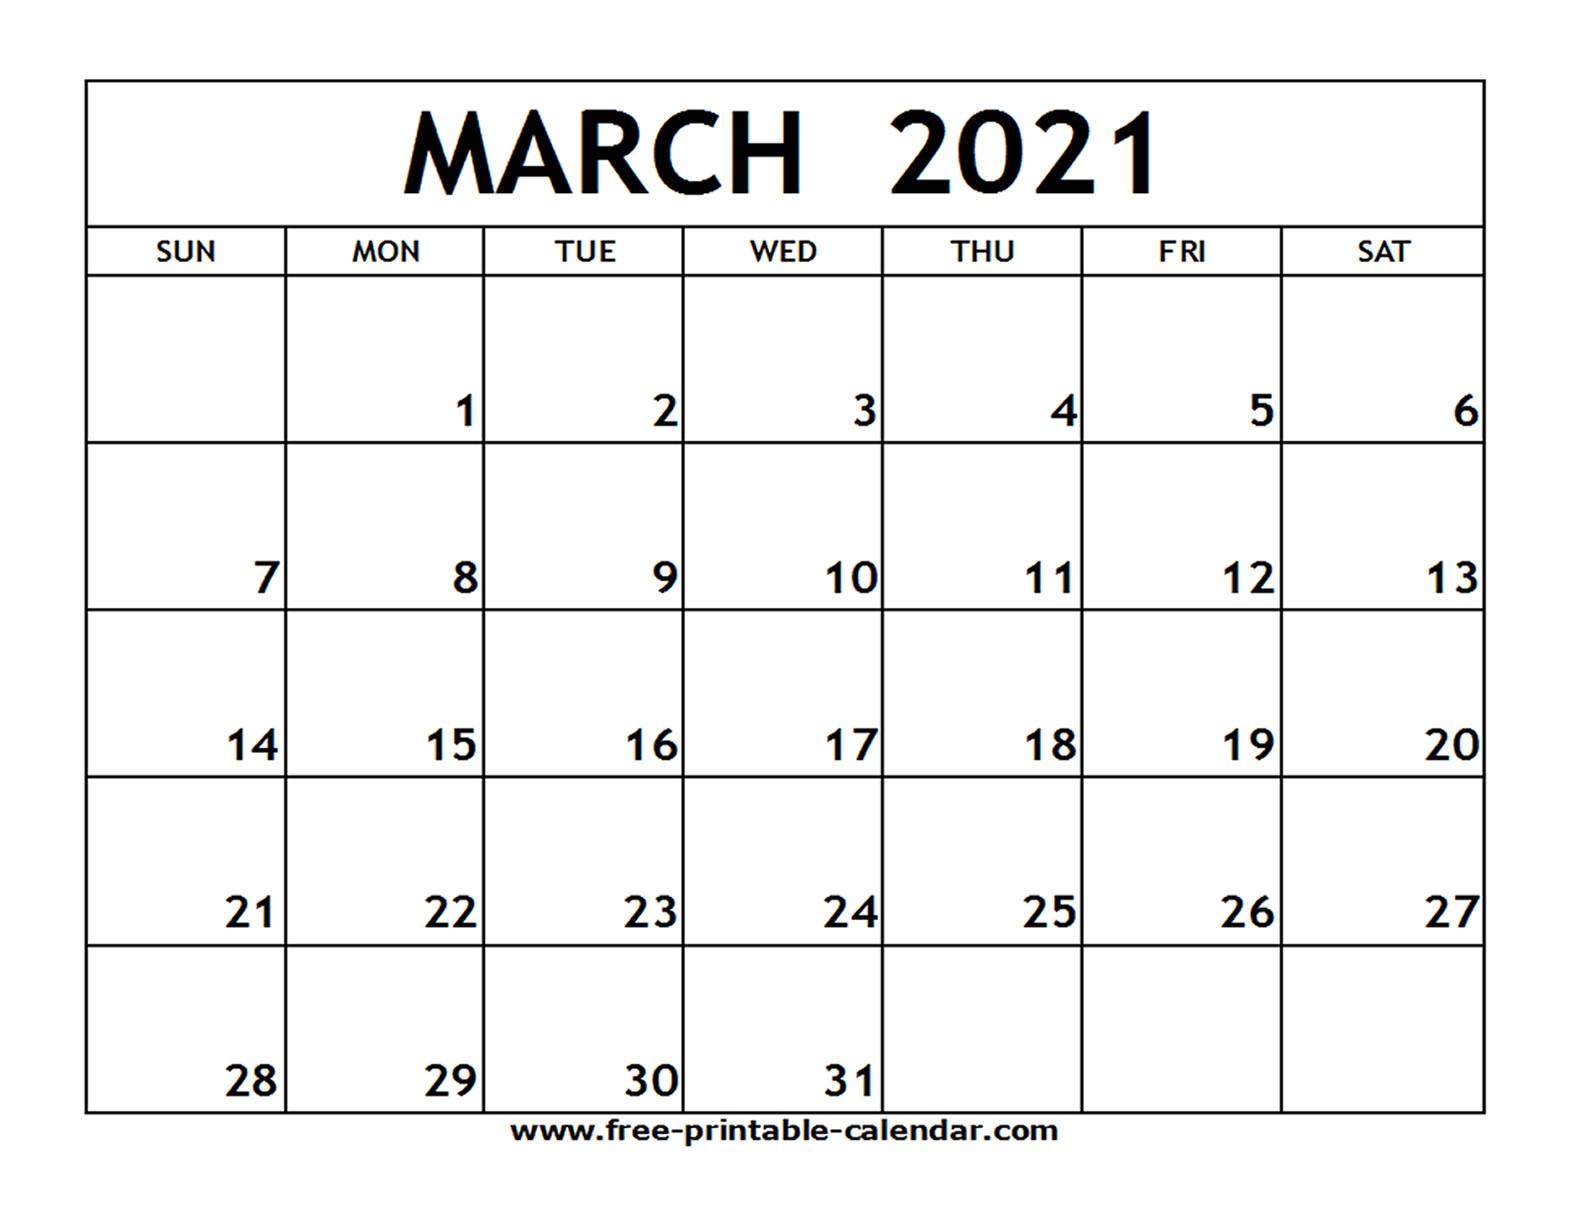 March 2021 Printable Calendar - Free-Printable-Calendar